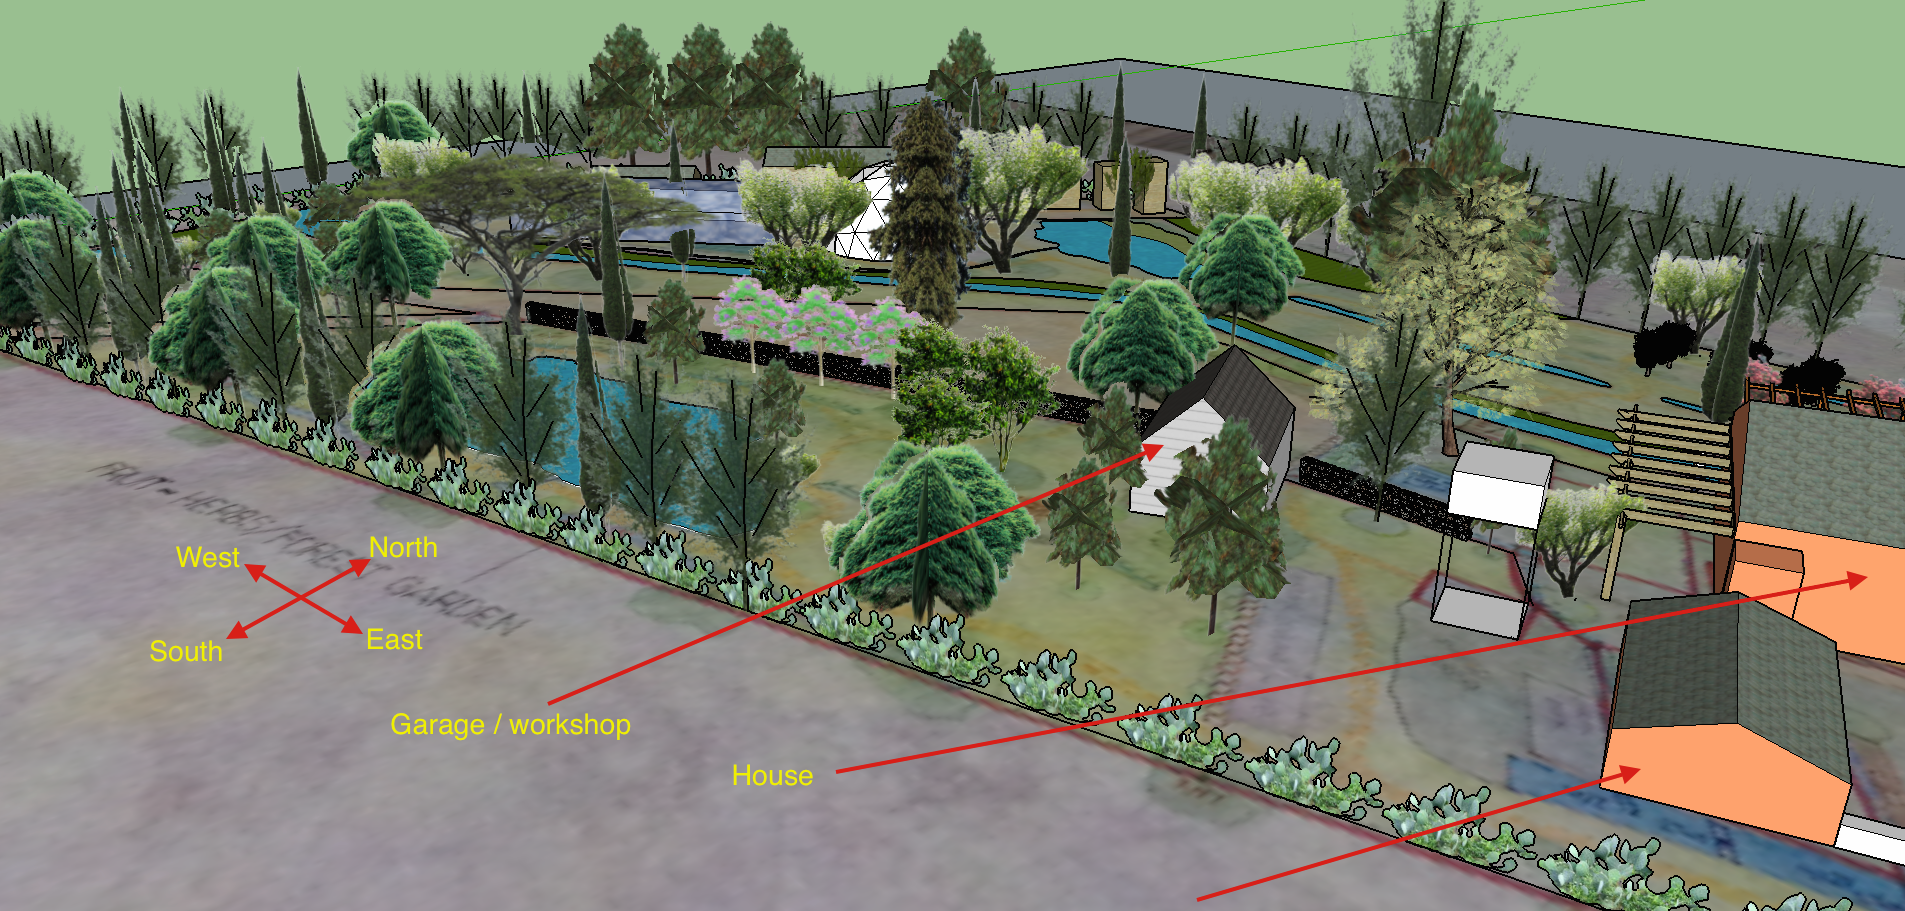 IEROKIPIO Land Design 2